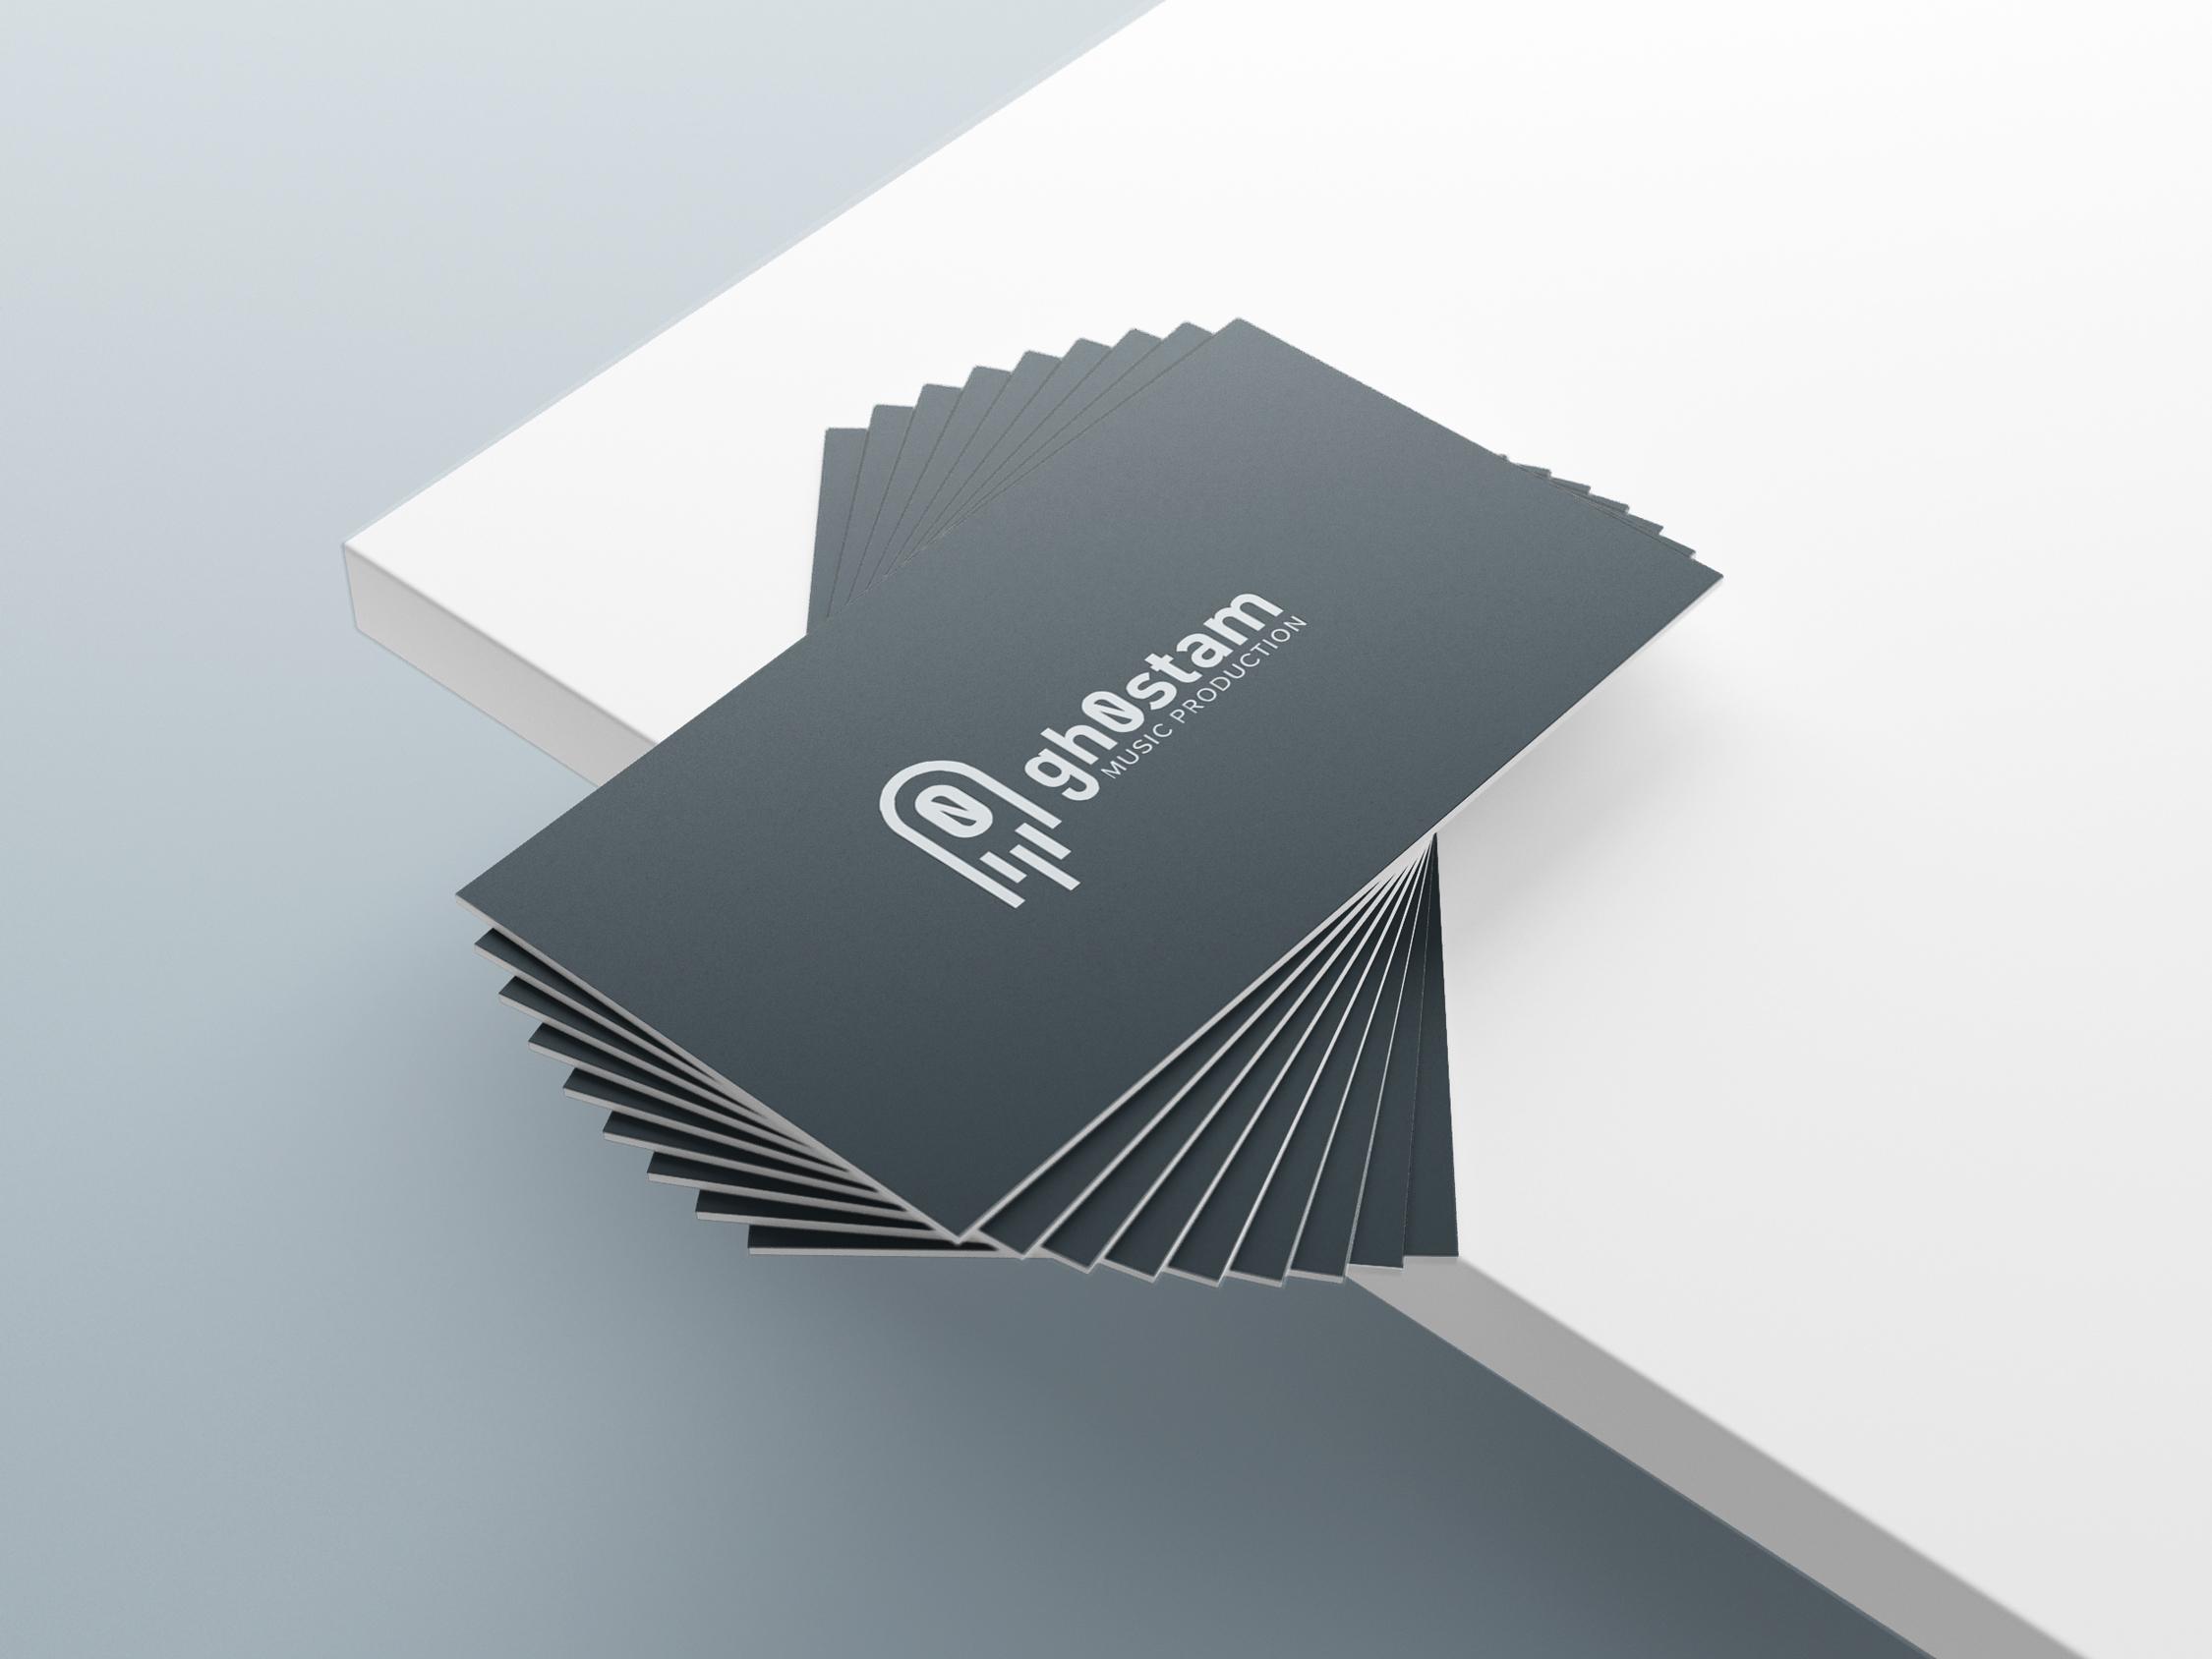 Gh0stam_Business_Card_Mockup_1.jpg